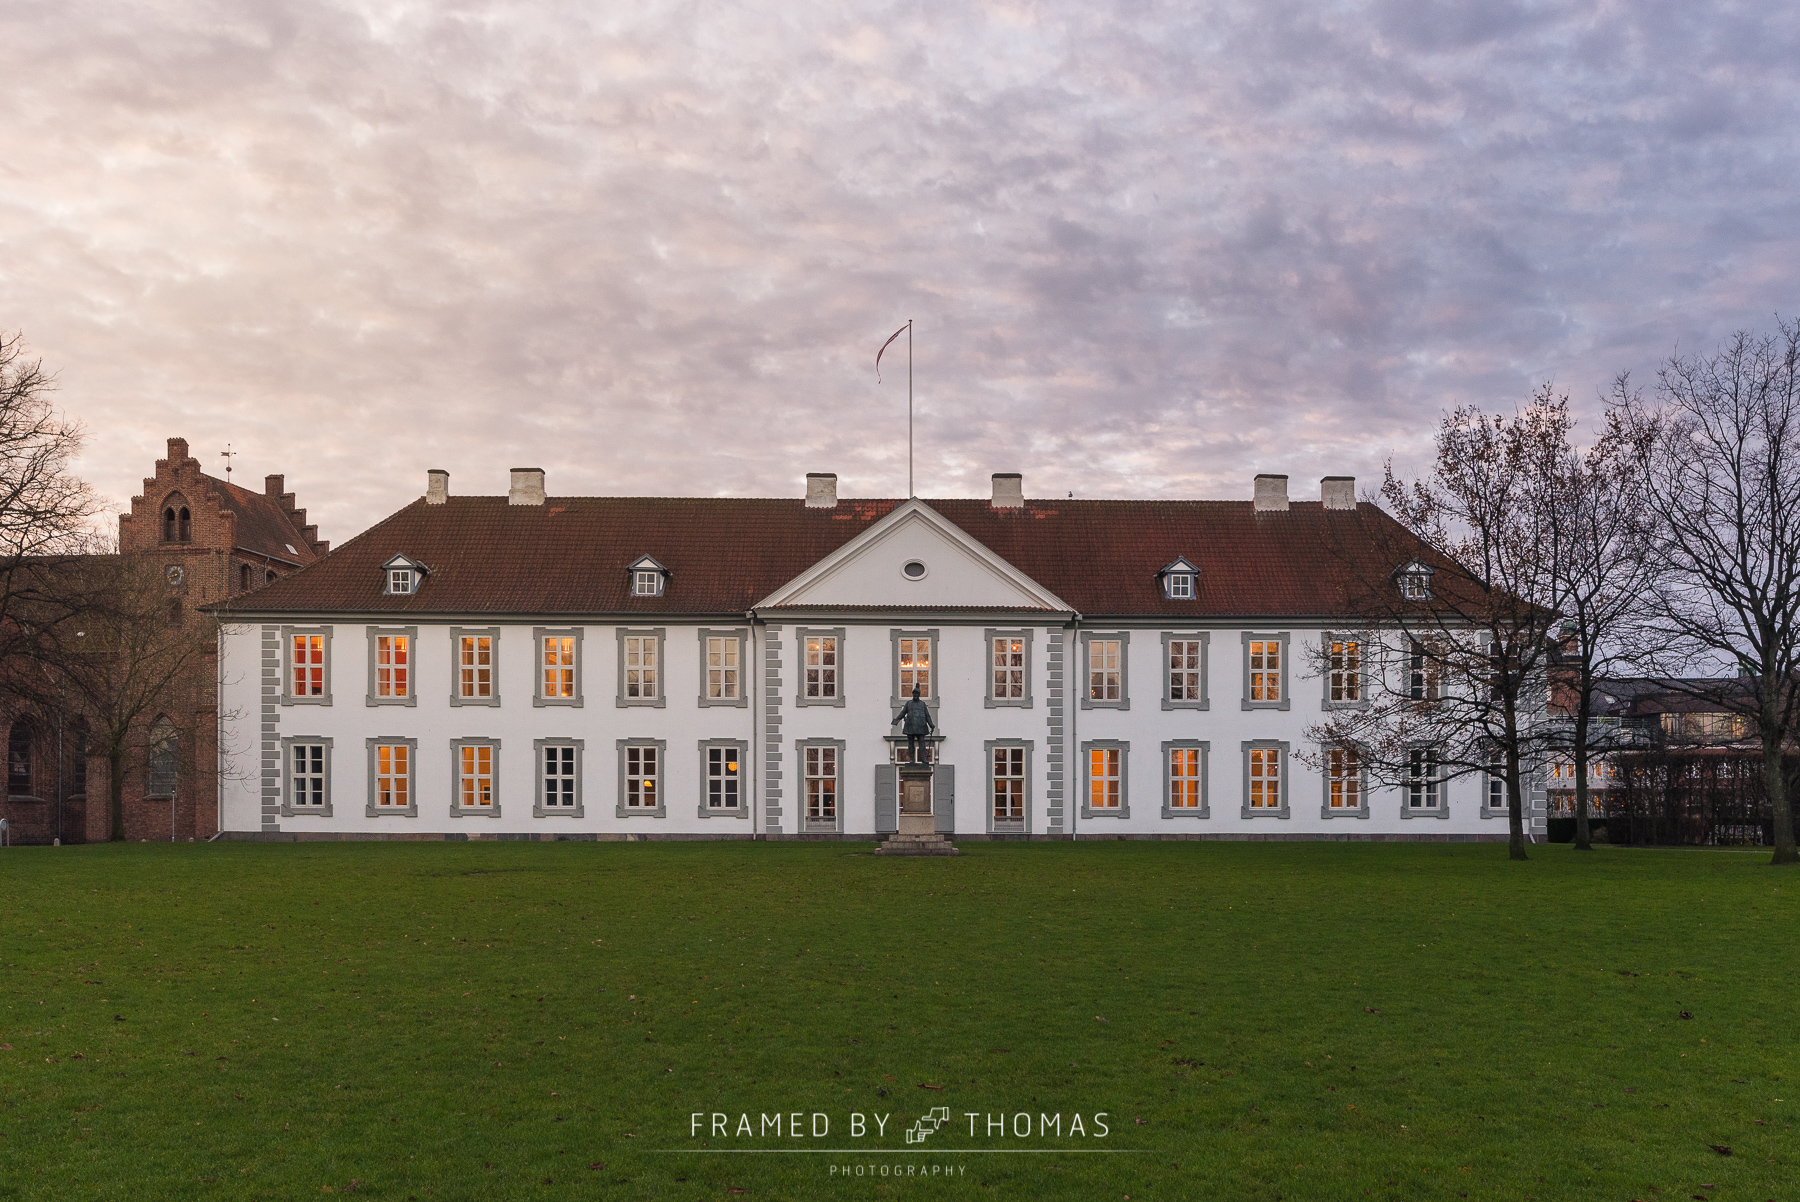 Odense, Denmark - December 7, 2015: The front of Odense slot (ca